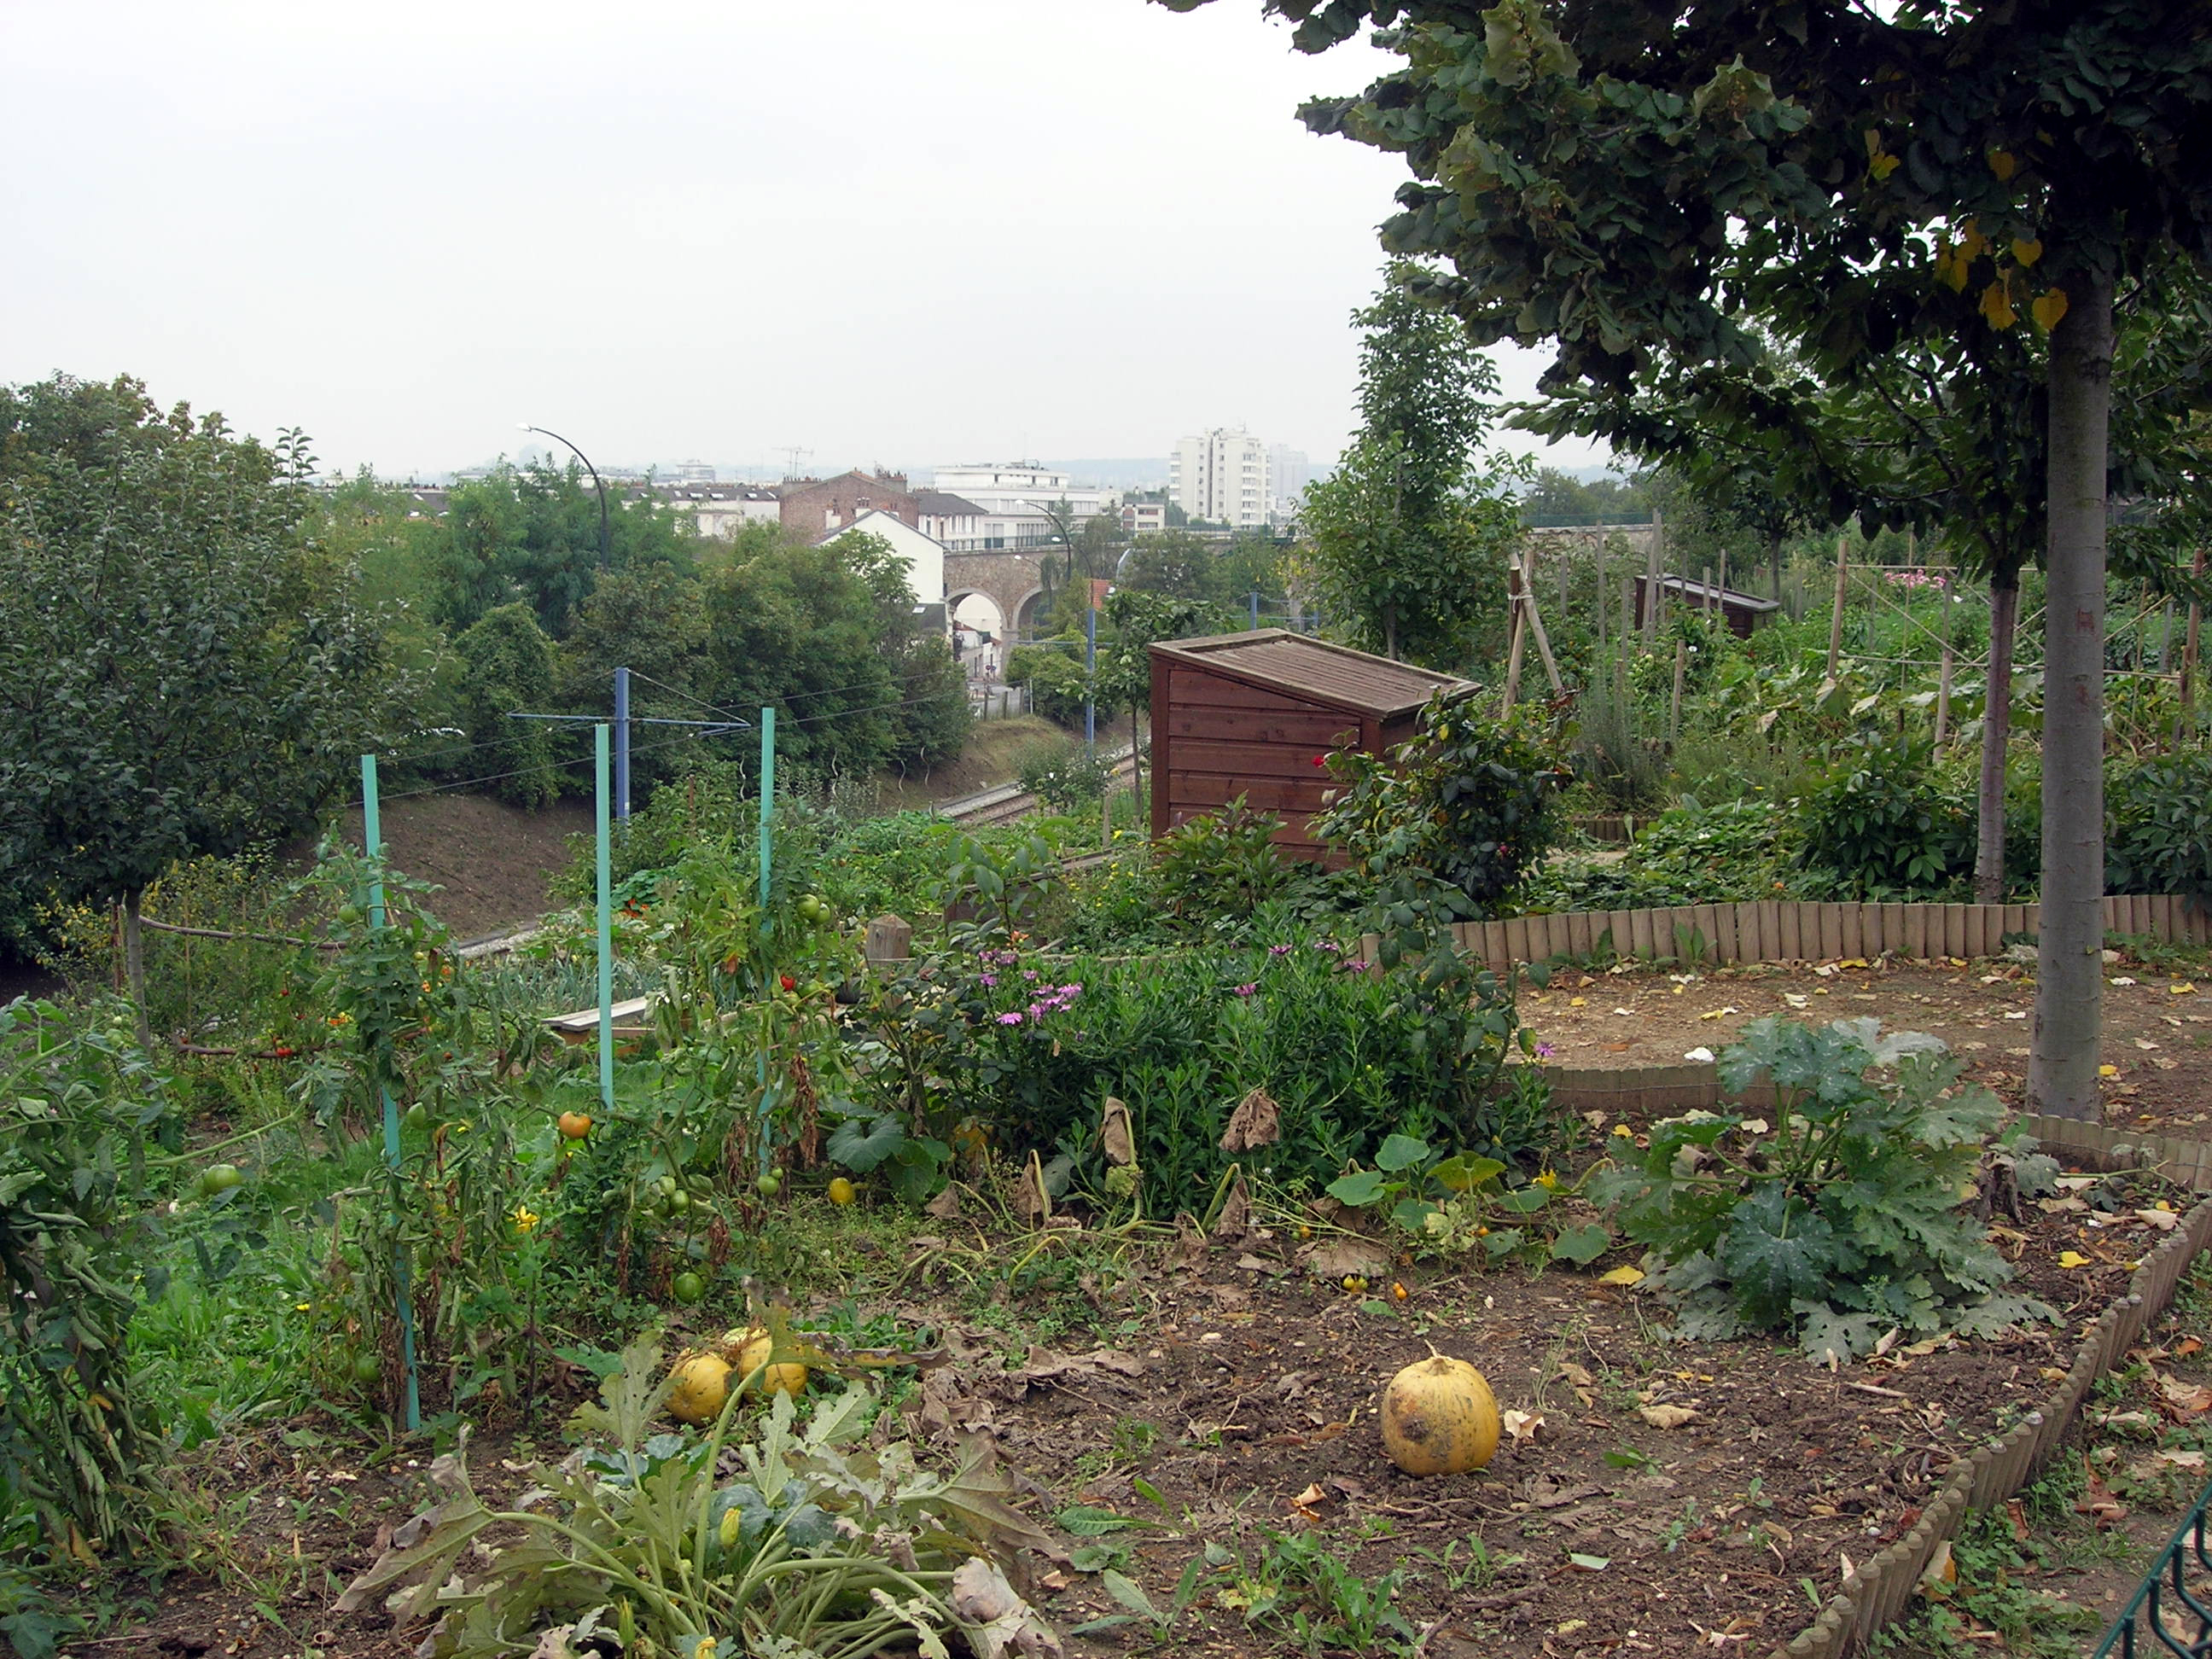 Fichier jardin ouvrier saint cloud 1 jpg wikip dia for Jardin ouvrier